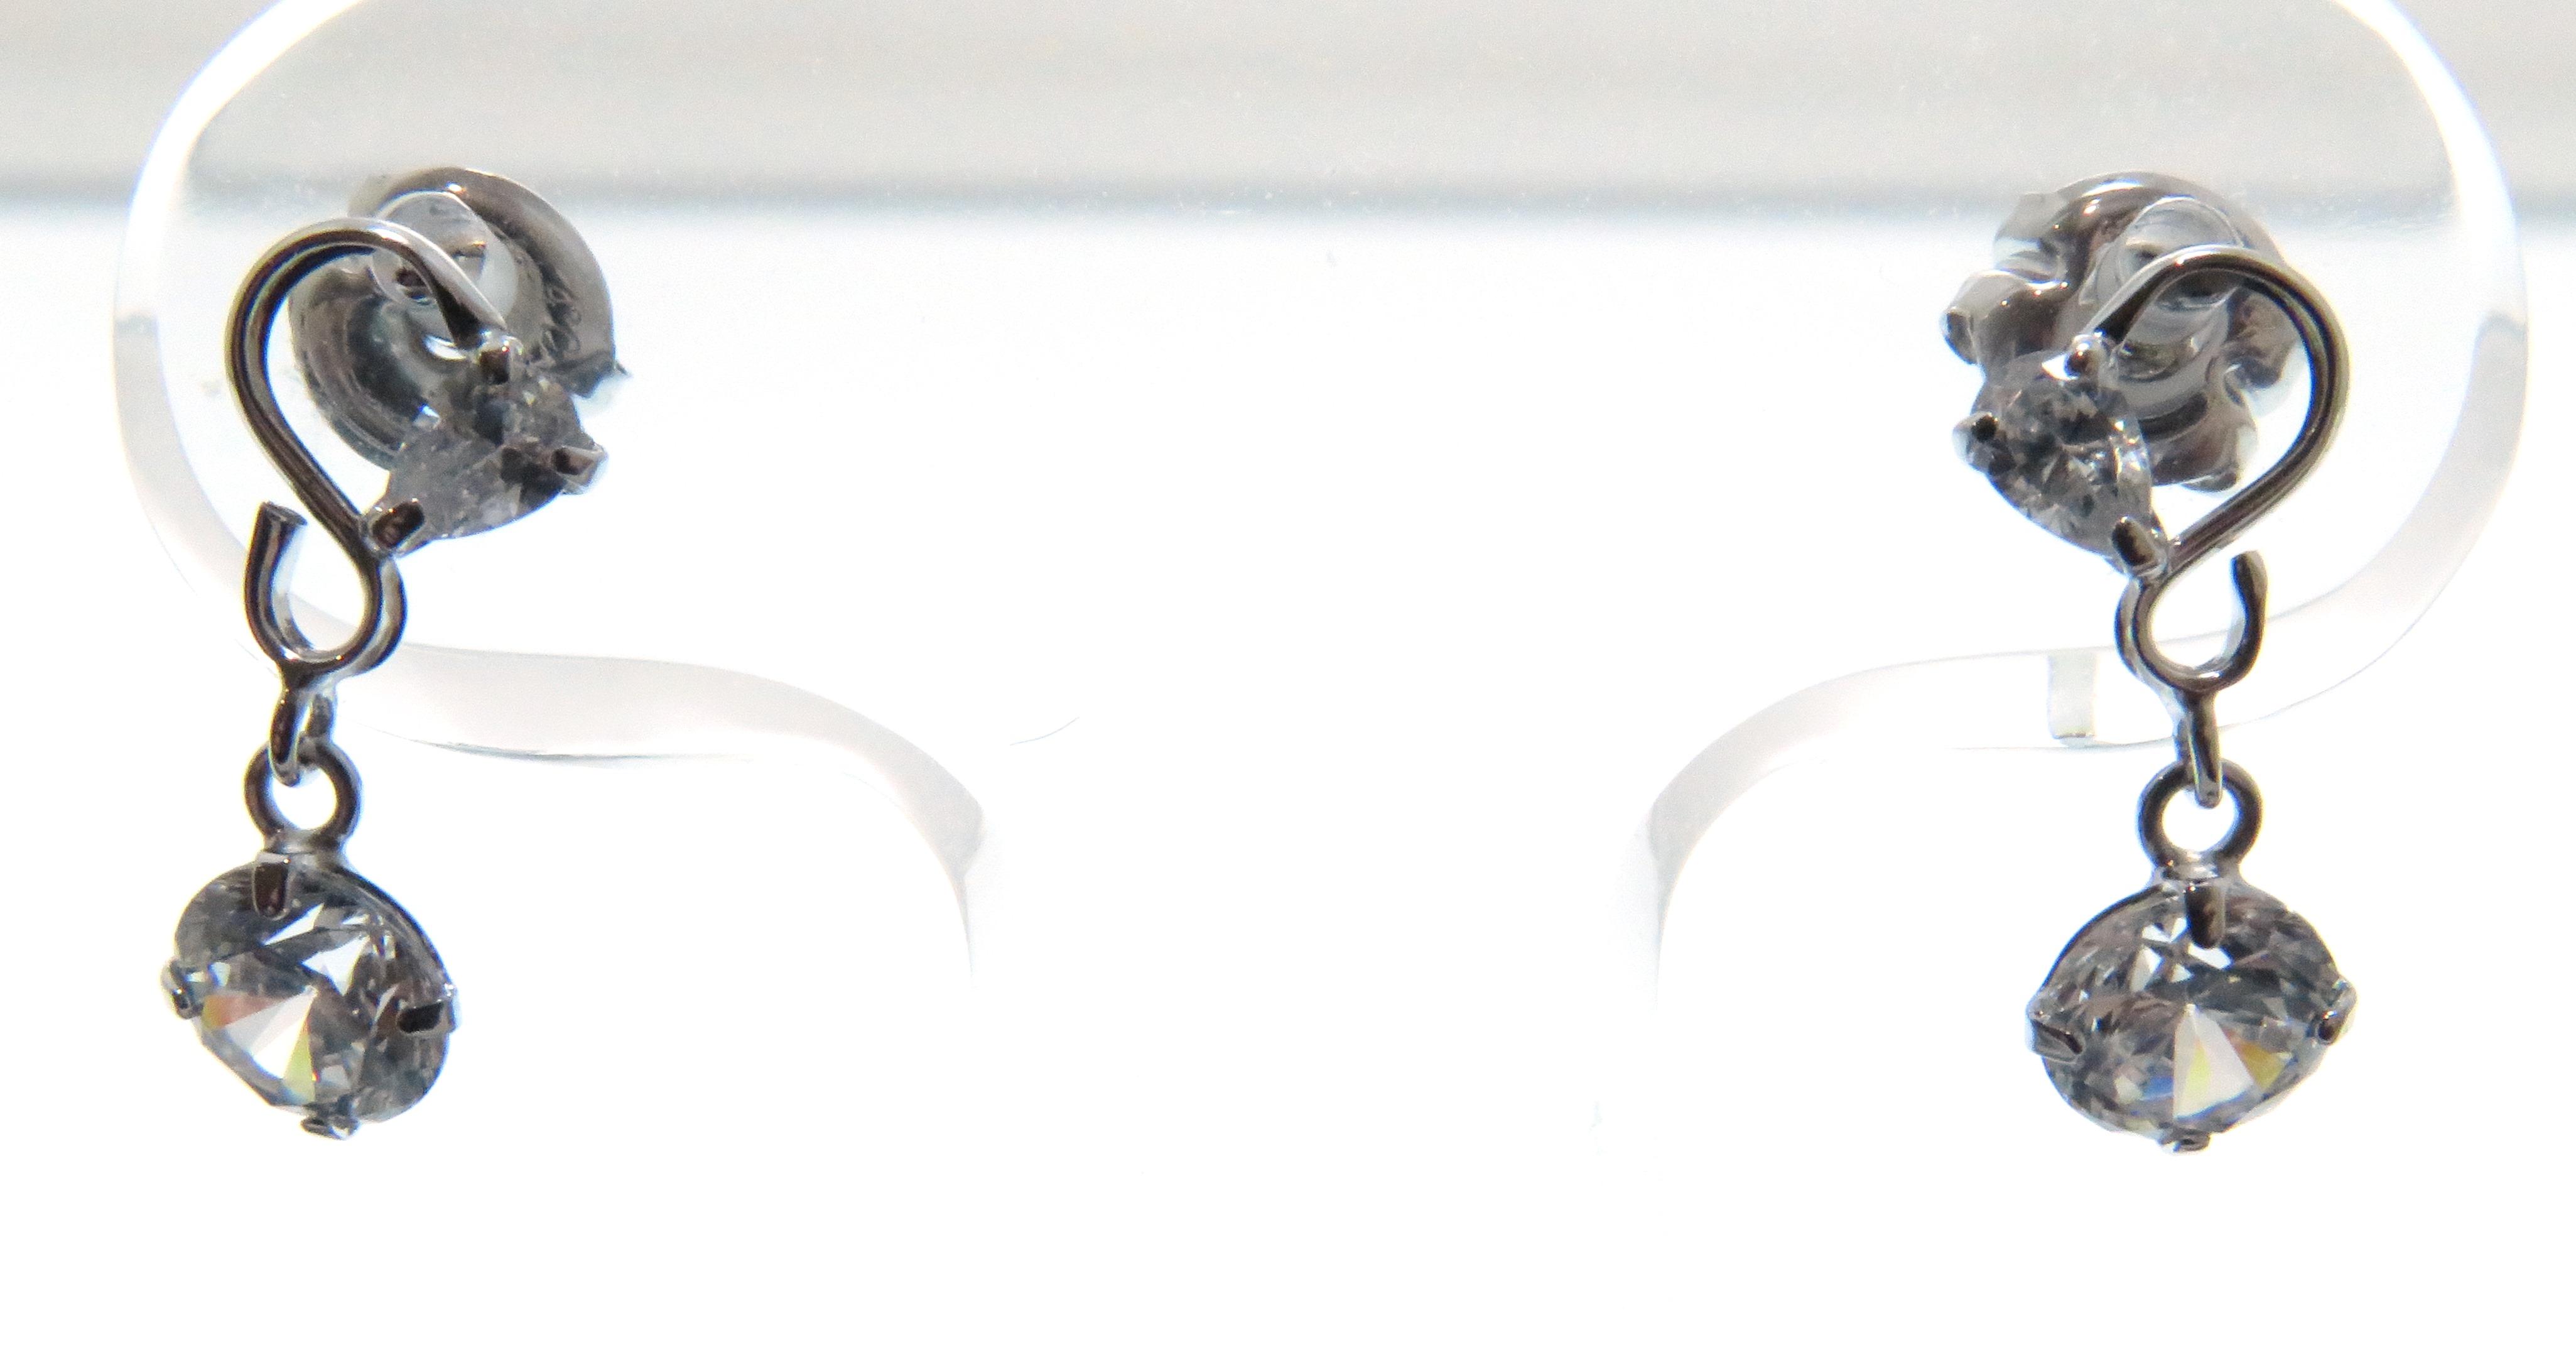 canal 4℃ カナルヨンドシー キュービックジルコニアピアス K10ホワイトゴールド キュービックジルコニア 全体重量約0.6g 【205】